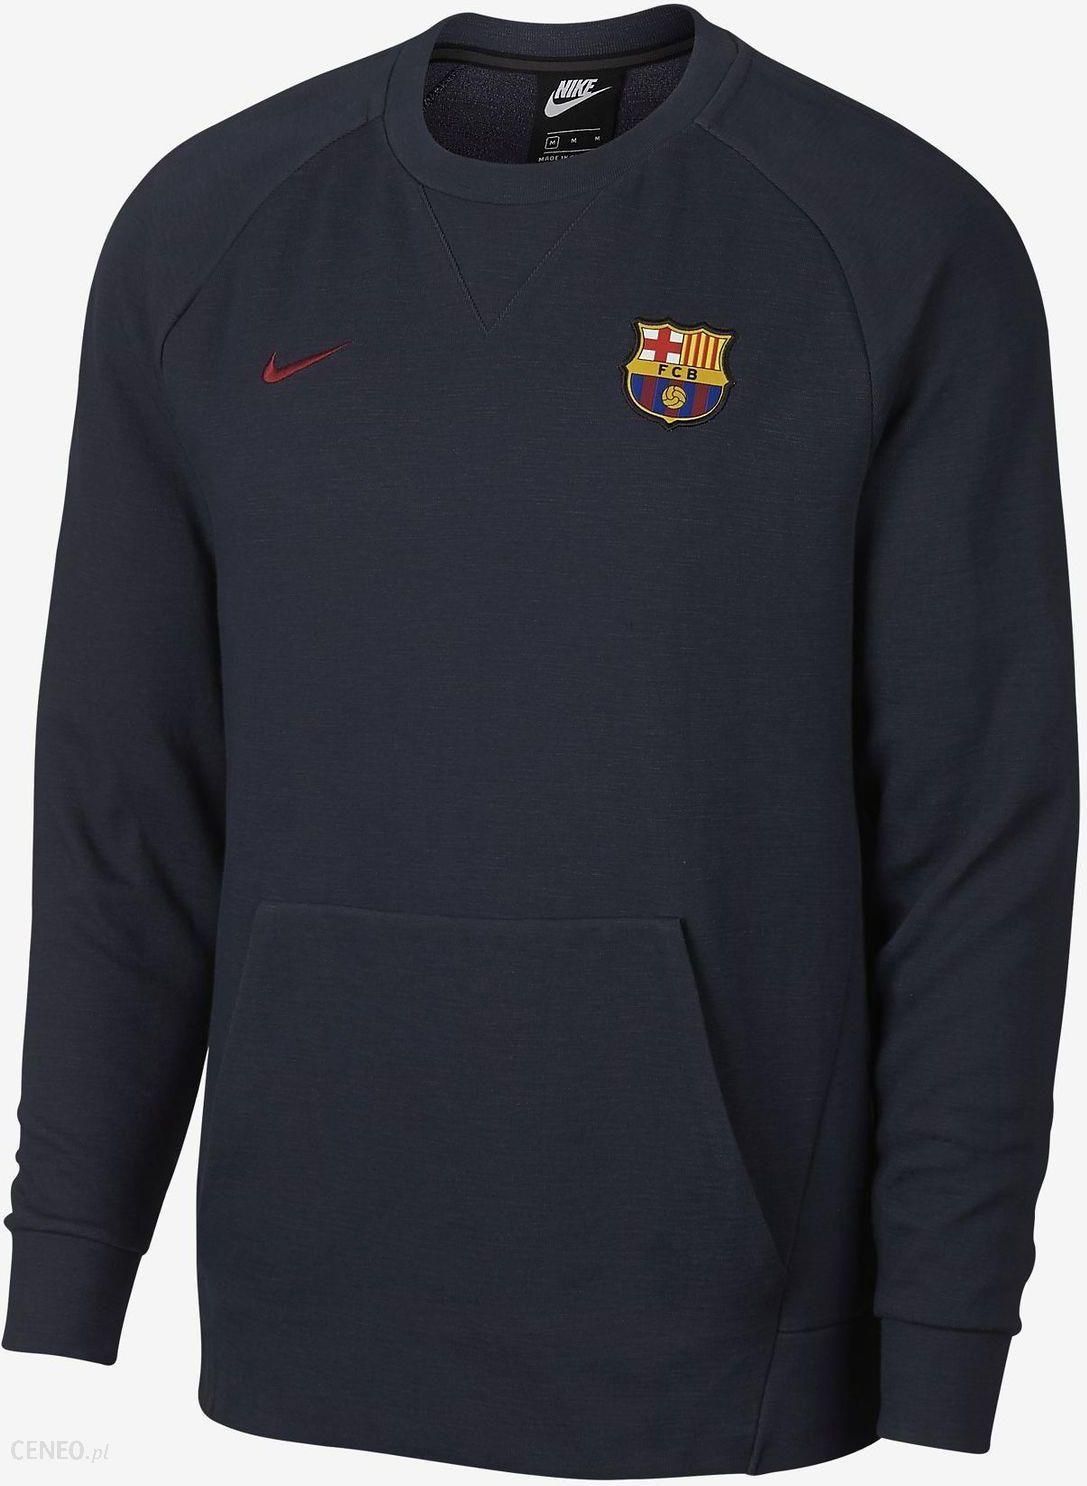 10c4d9a63 Bluza męska FC Barcelona Crew Optic Nike (granatowa) - Ceny i opinie ...